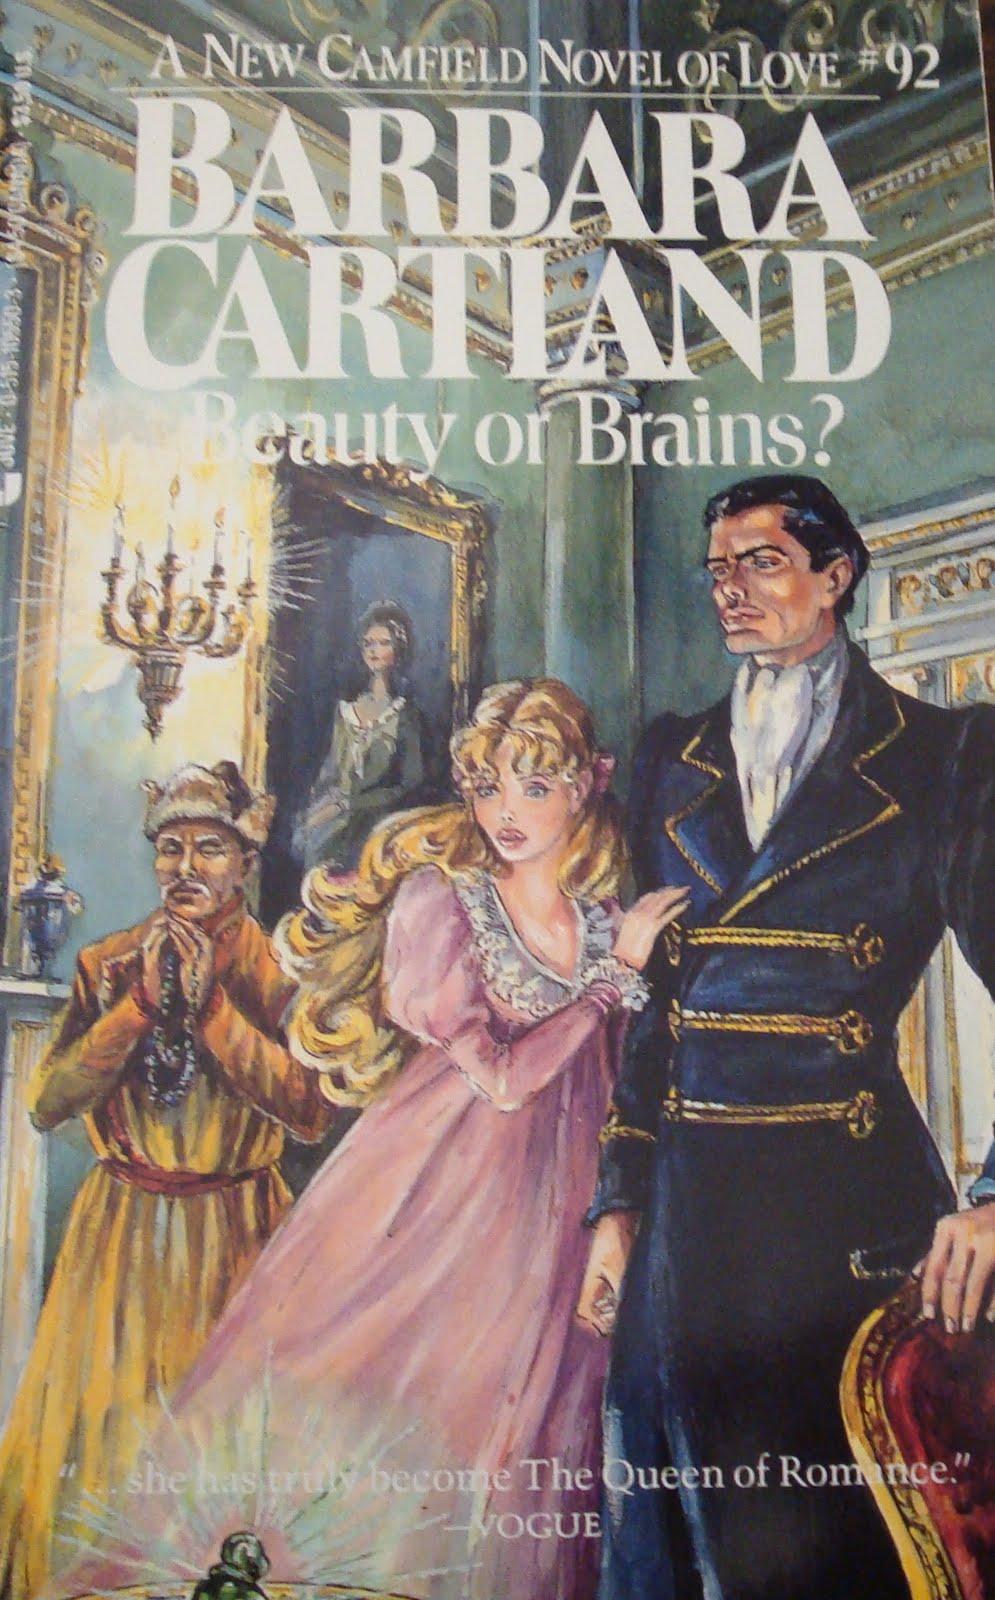 Book Cover Series January : Barbara cartland books and cover art january